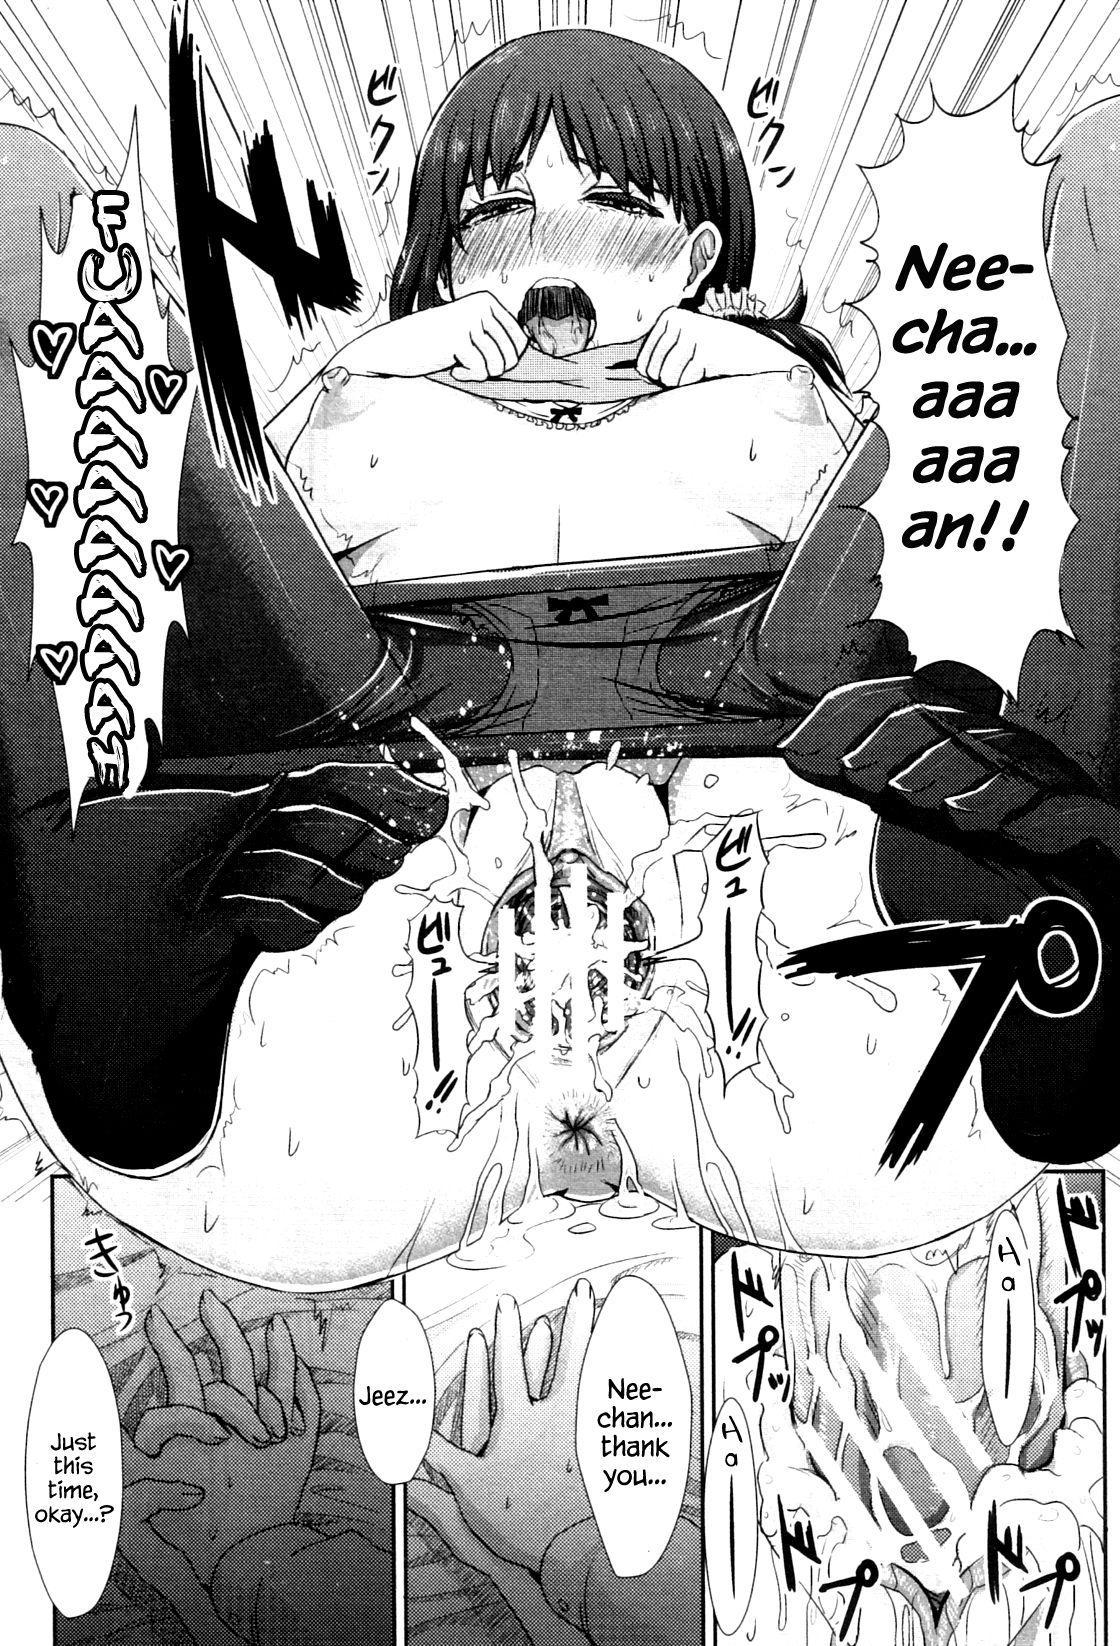 [Shinooka Homare] Onee-chan no Stocking | Onee-chan's Stockings (COMIC MILF 2012-07 Vol. 7) [English] [Hennojin] 27